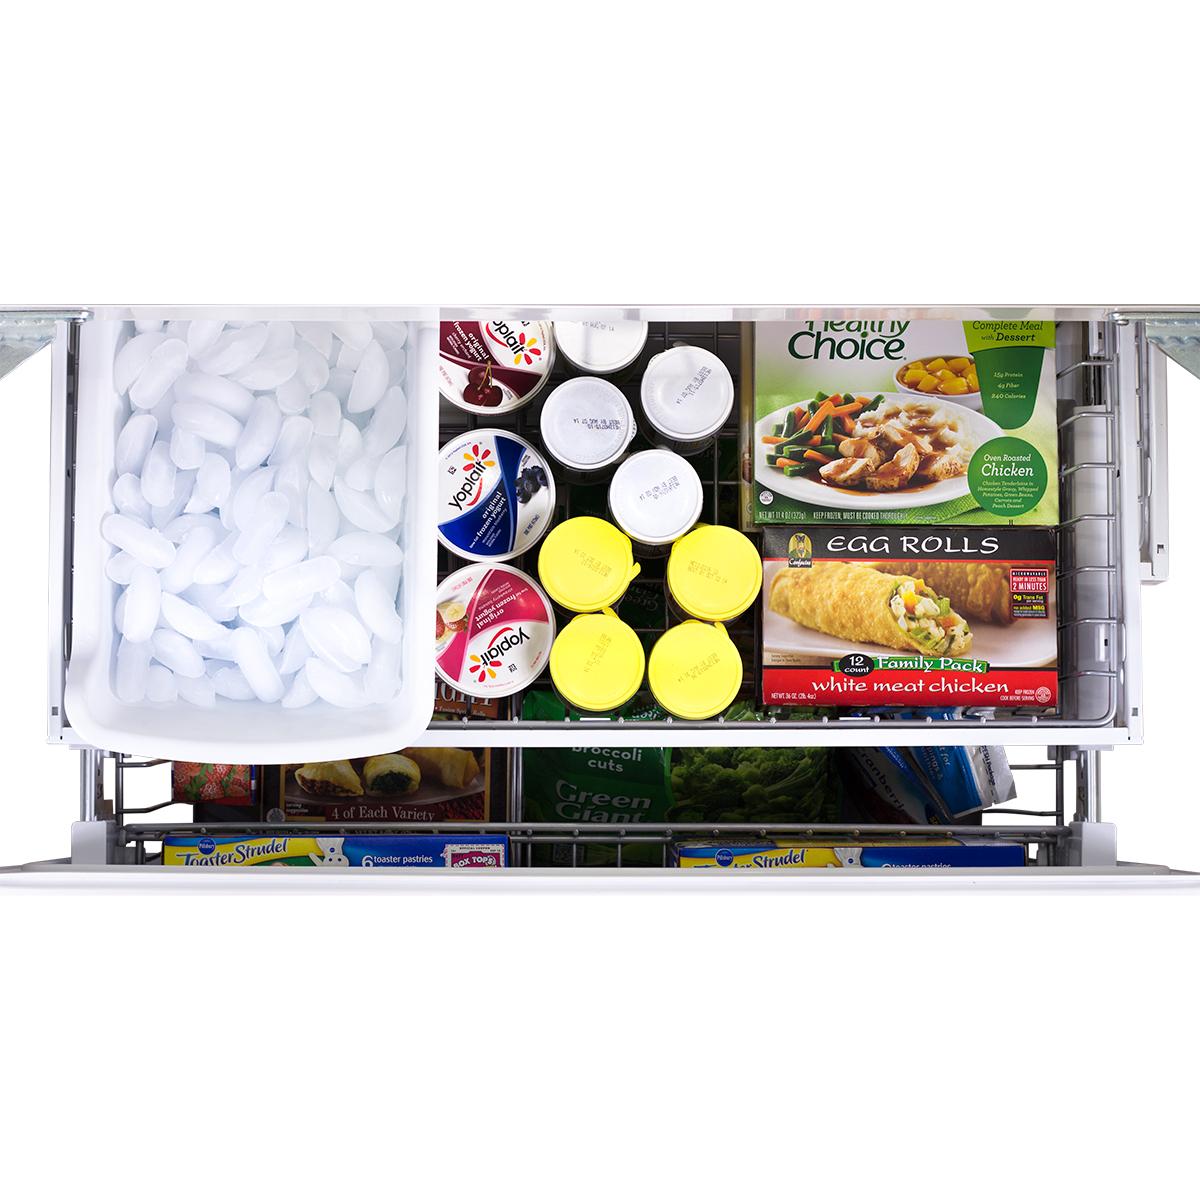 "Model: AMPROFD23-SS | Marvel  Marvel Professional 36"" French Door Refrigerator with Bottom Freezer- 36? French Door Refrigerator with Bottom Freezer"